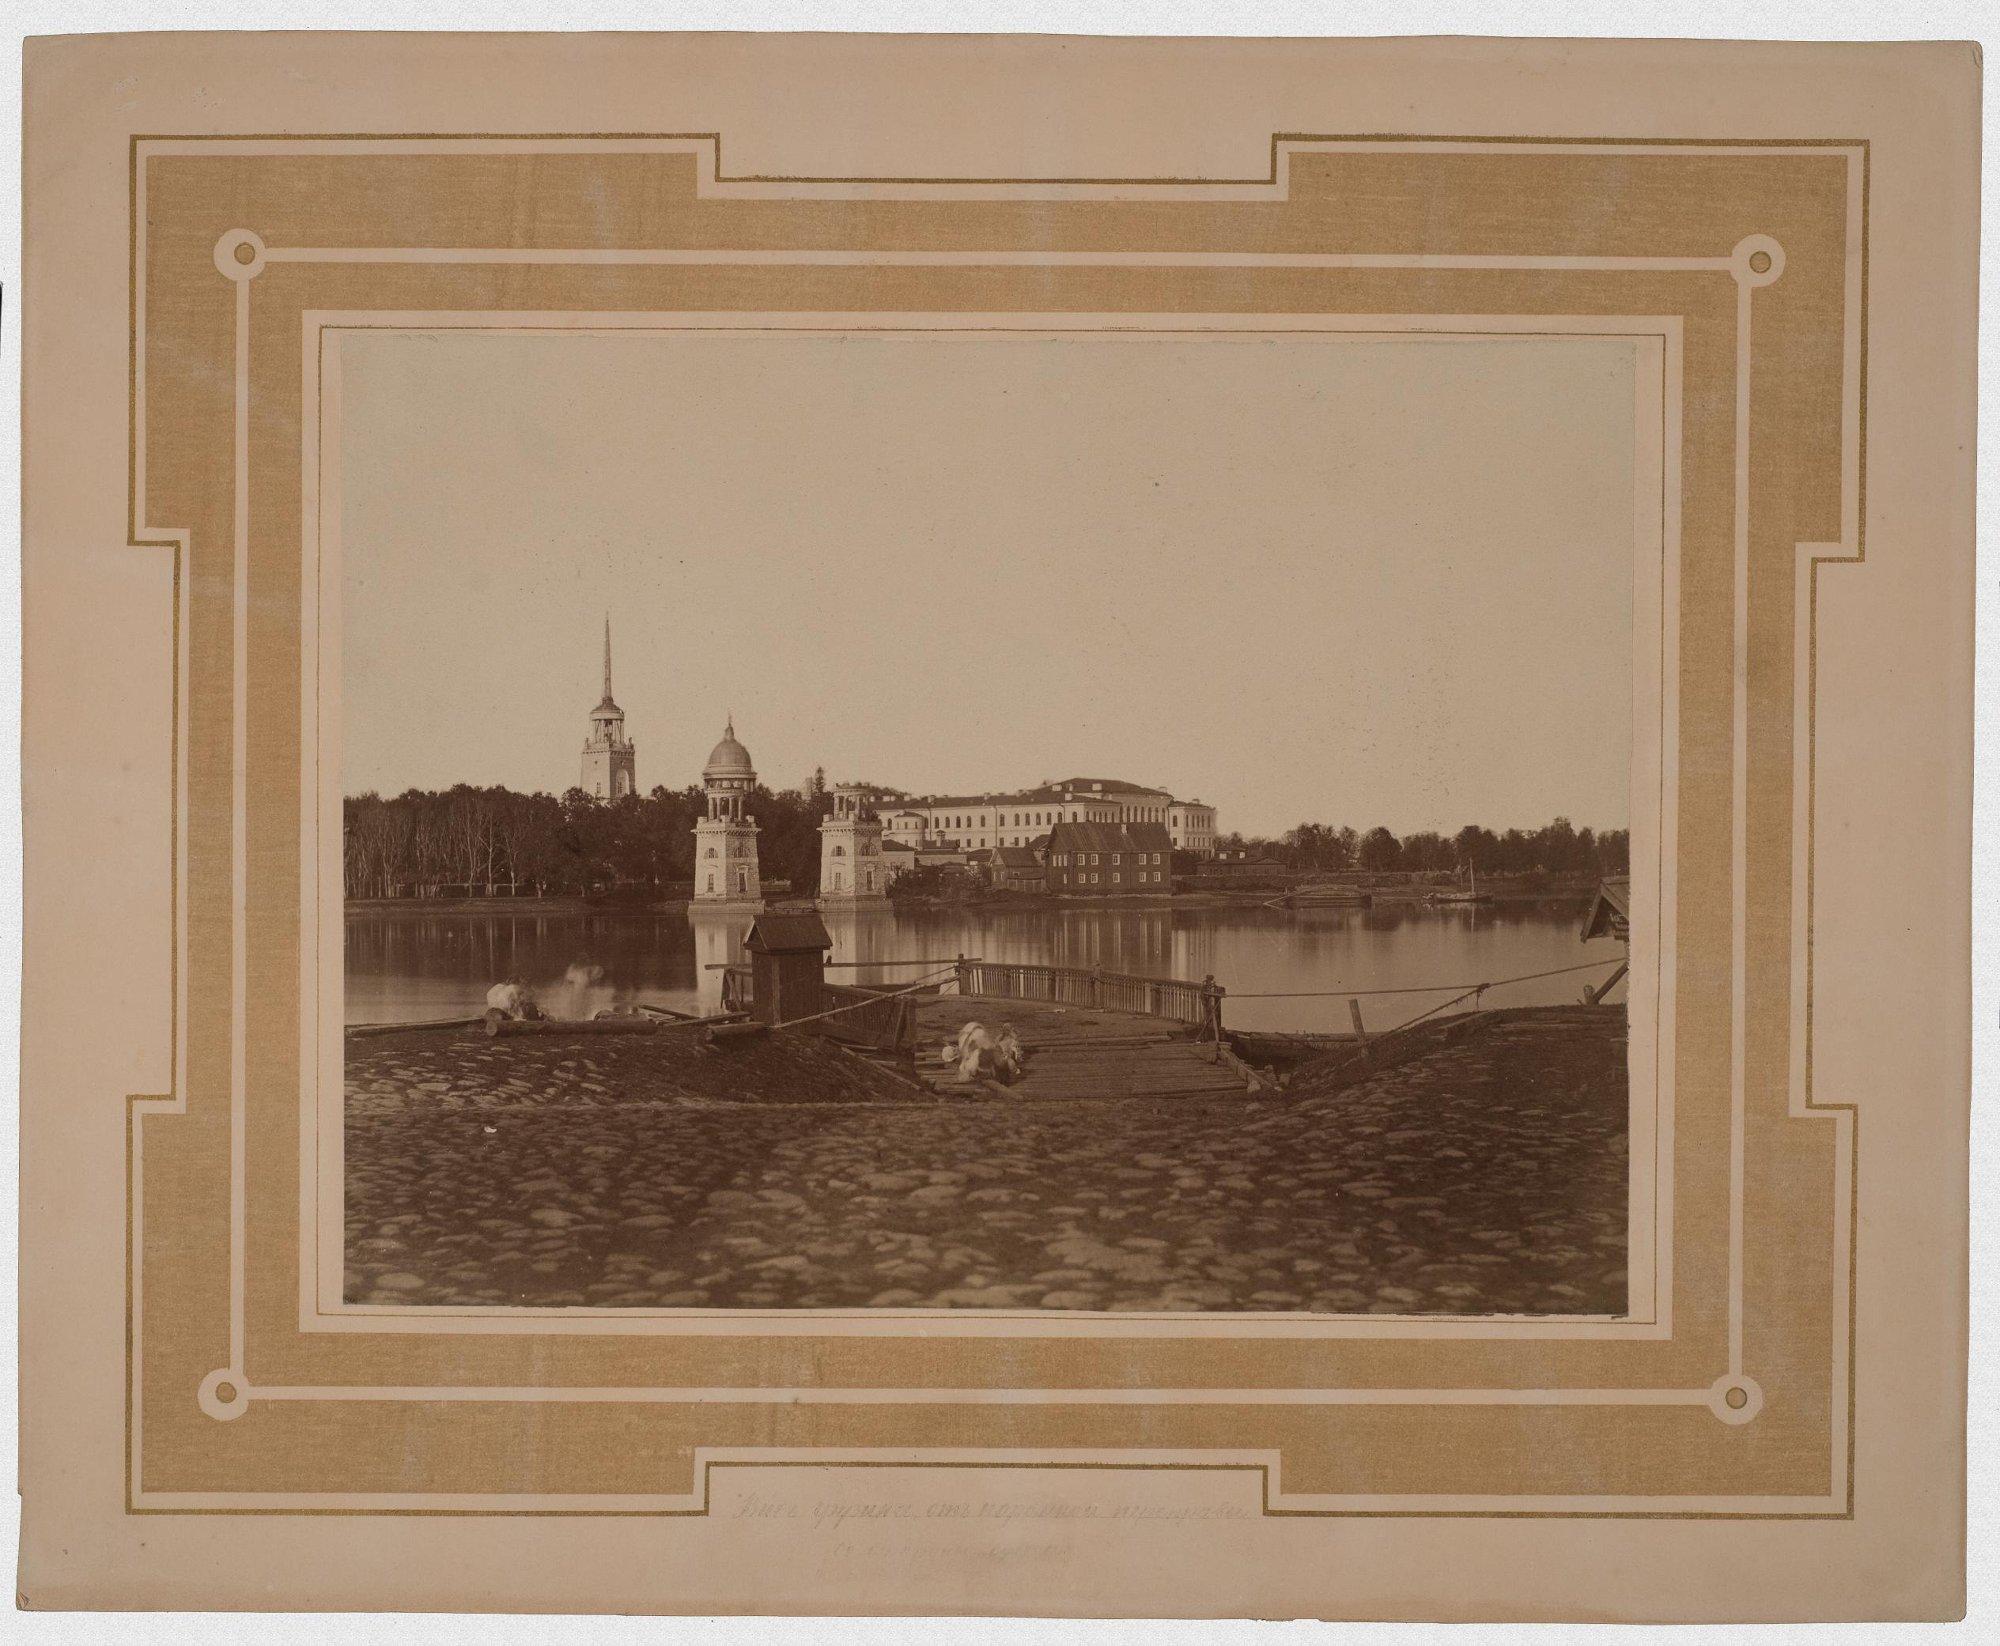 1880-е. Общий вид Грузина от паромной пристани